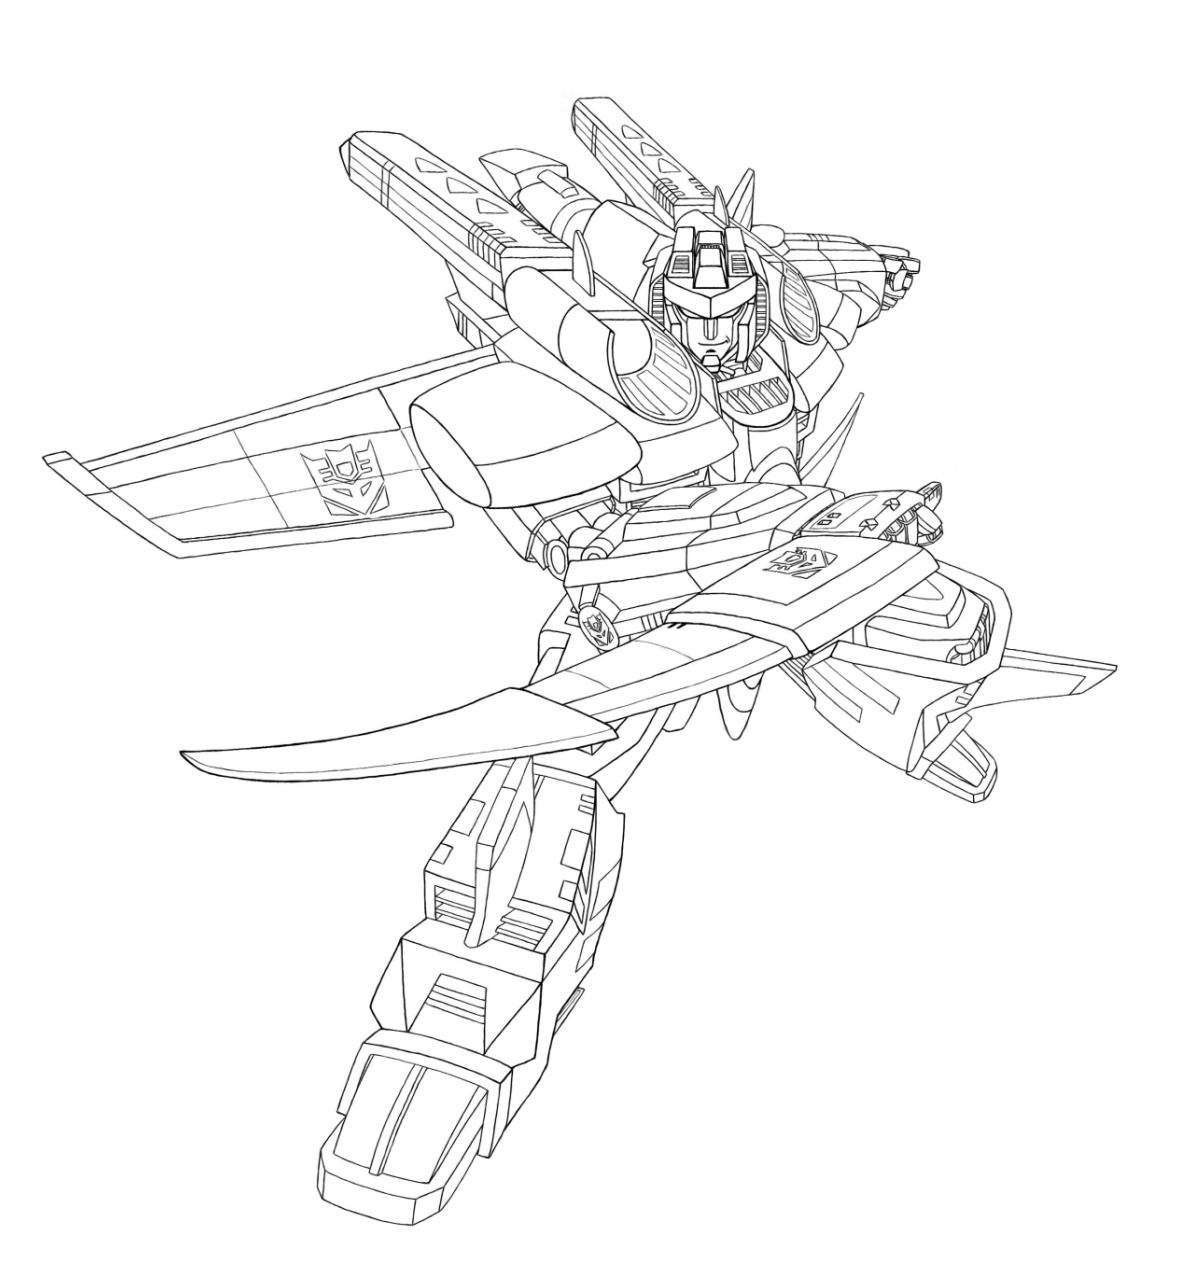 135 Dibujos De Transformers Para Colorear | Oh Kids | Page 5 avec Dessins De Coloriage Transformers Imprimer